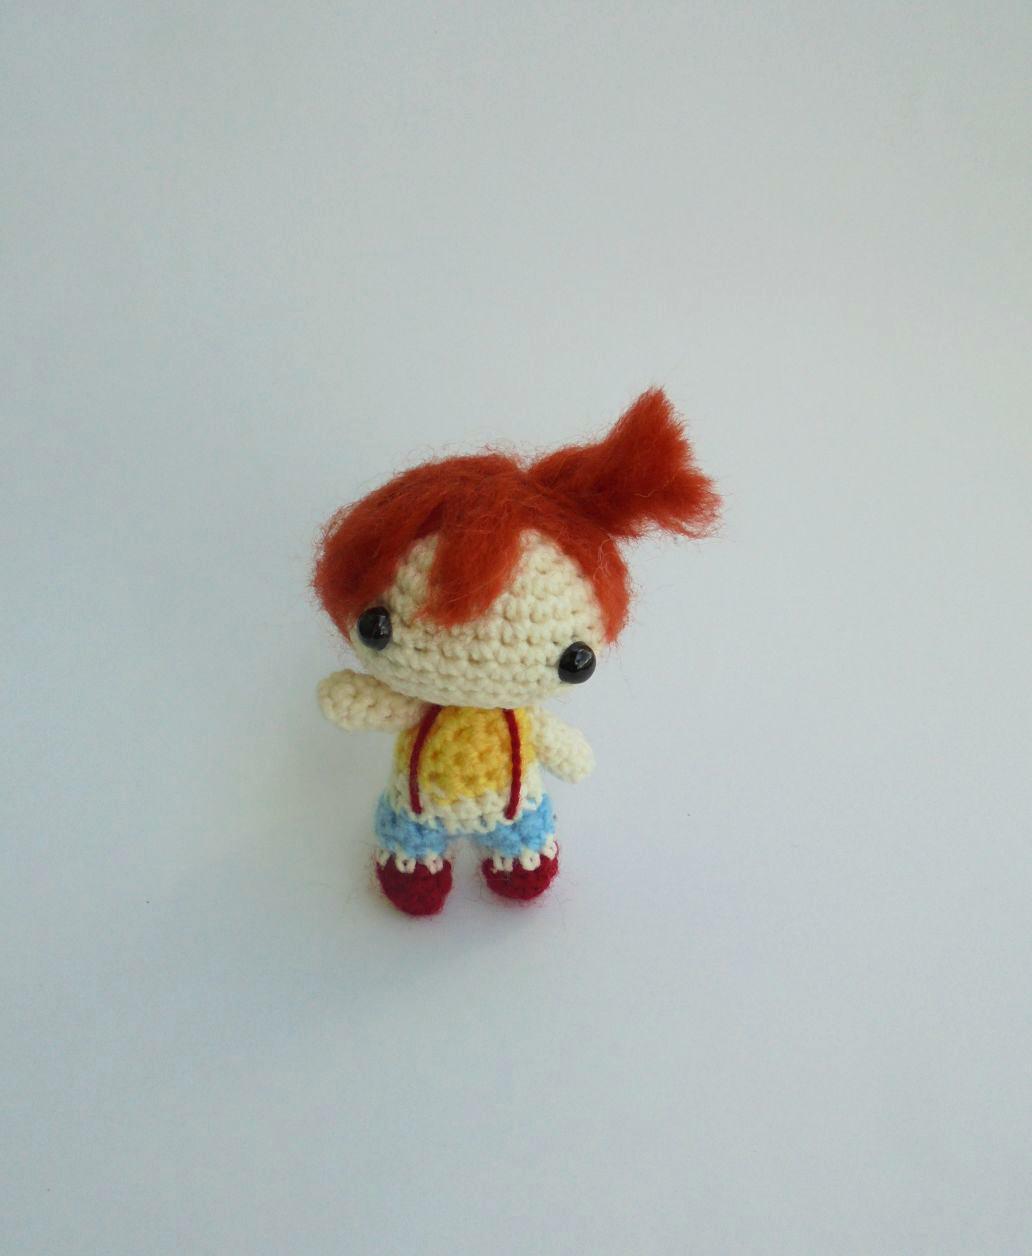 Miniature Amigurumi Doll : Chibi misty miniature amigurumi pokemon go doll by